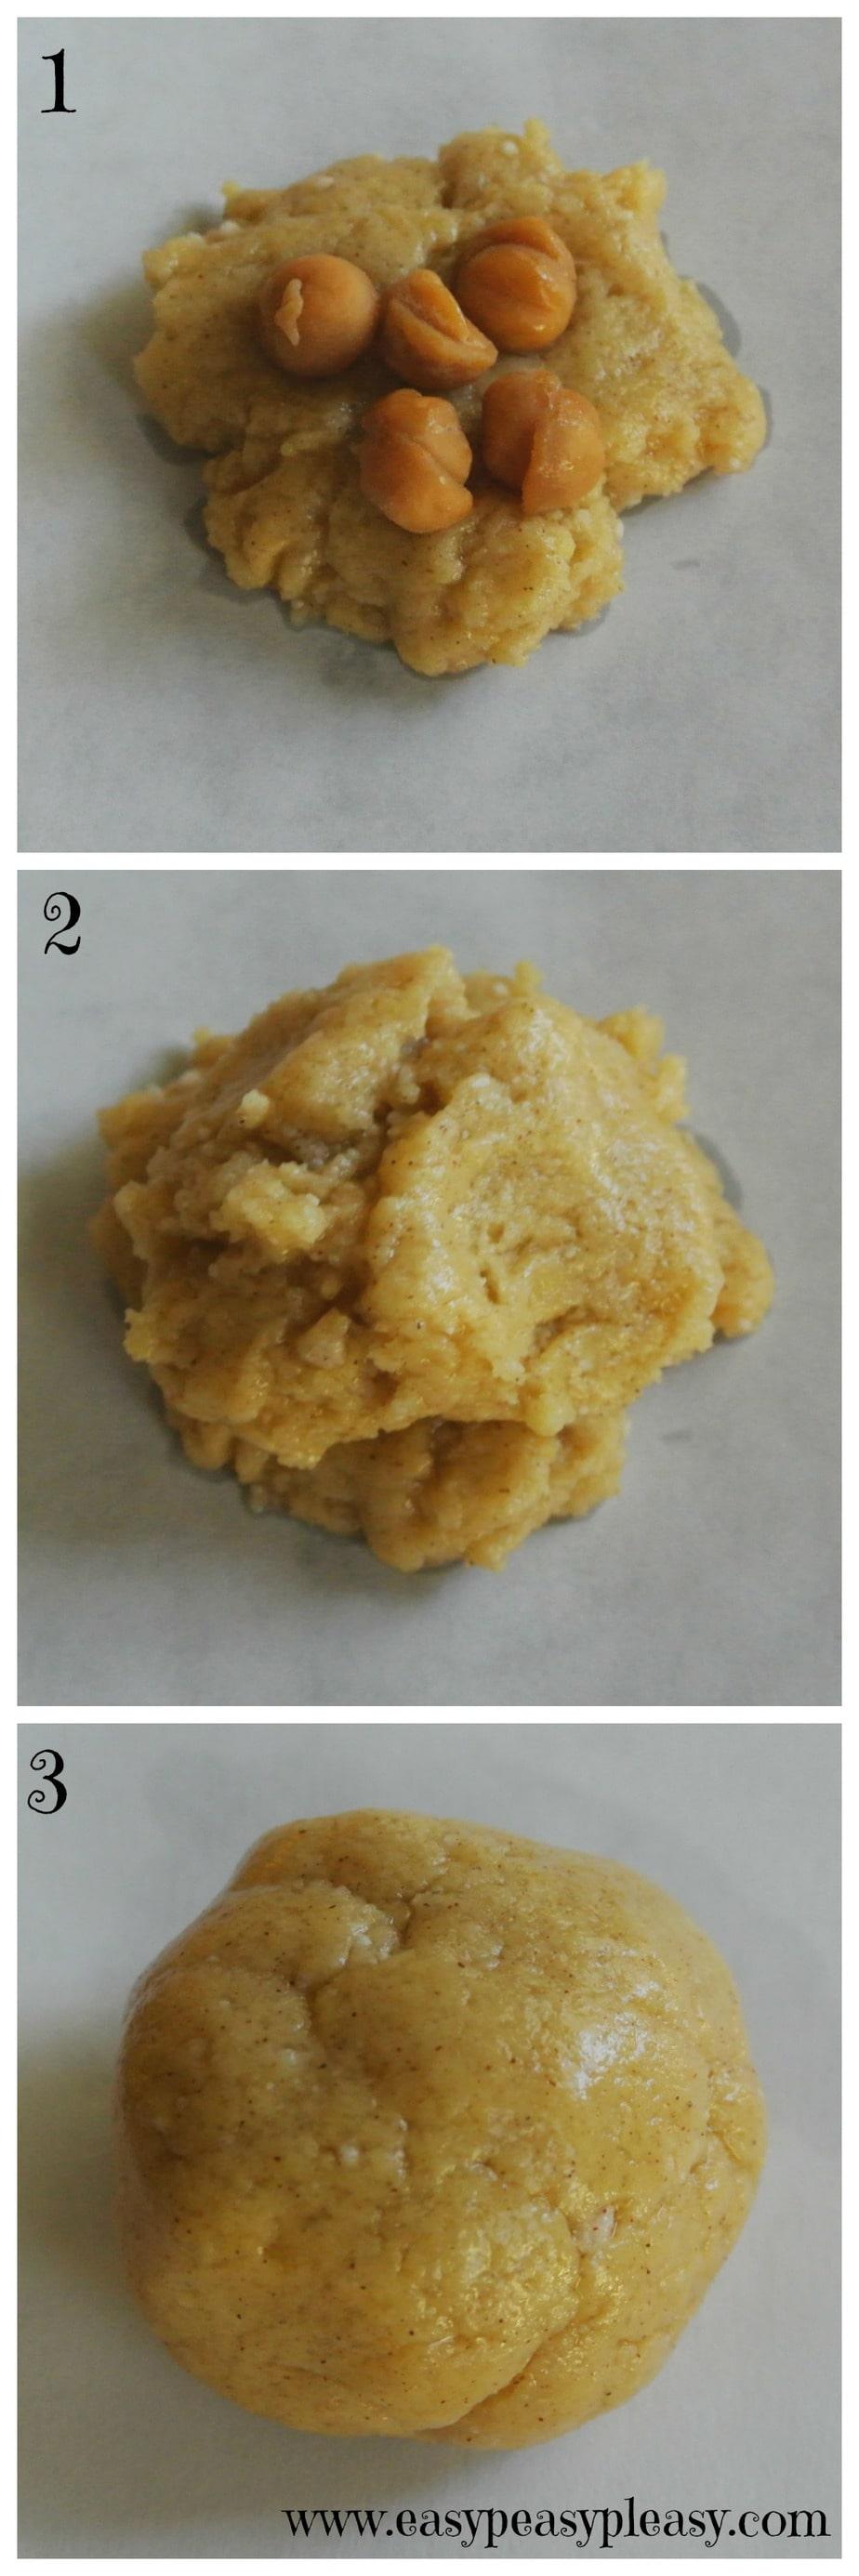 Easy Cinnamon Bun Cake Recipe